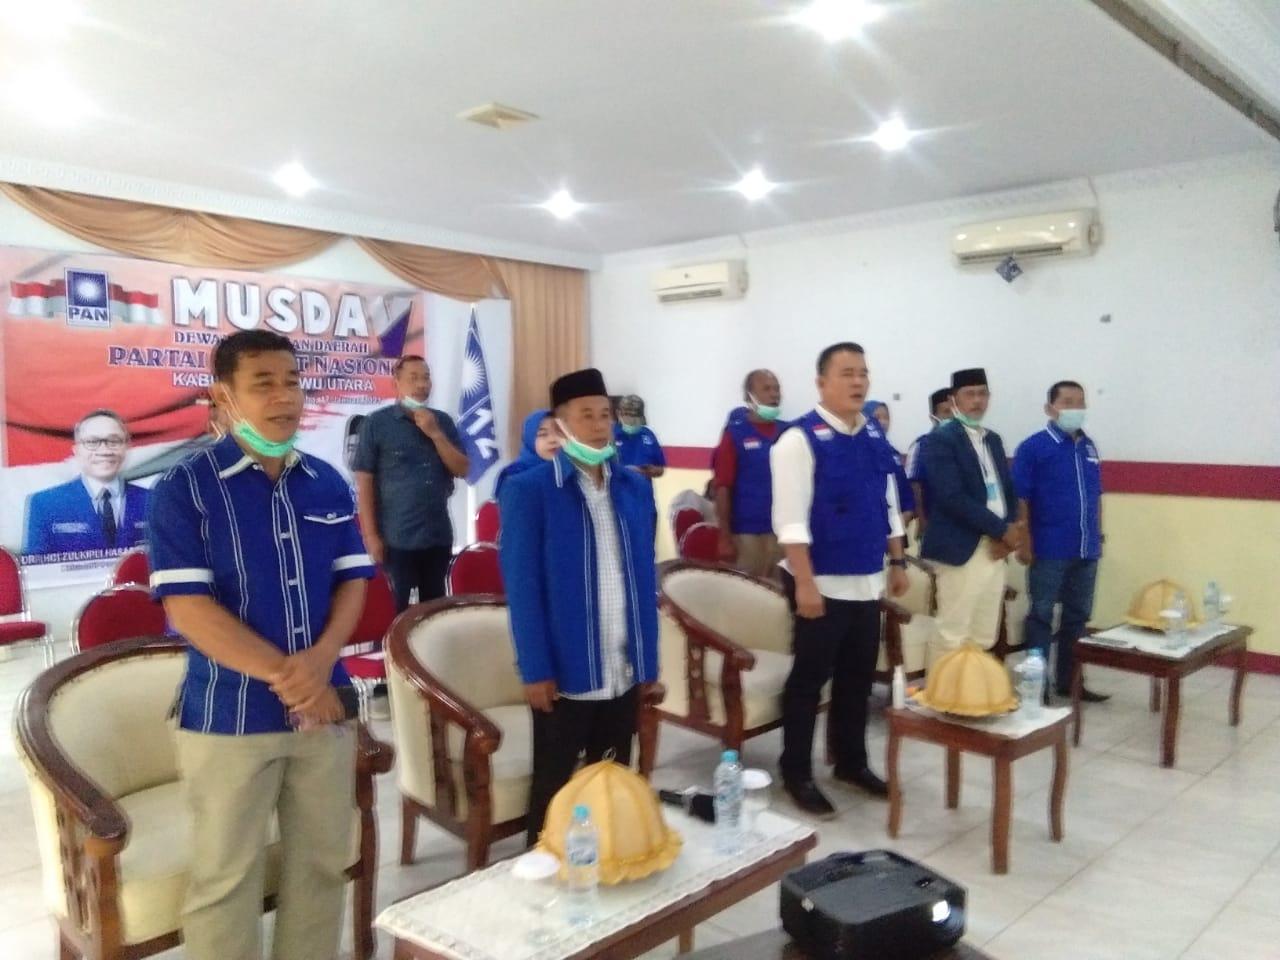 Ketua DPD PAN Luwu Utara, Karemuddin :  Bersinergi Dengan Pers Sangat Wajib